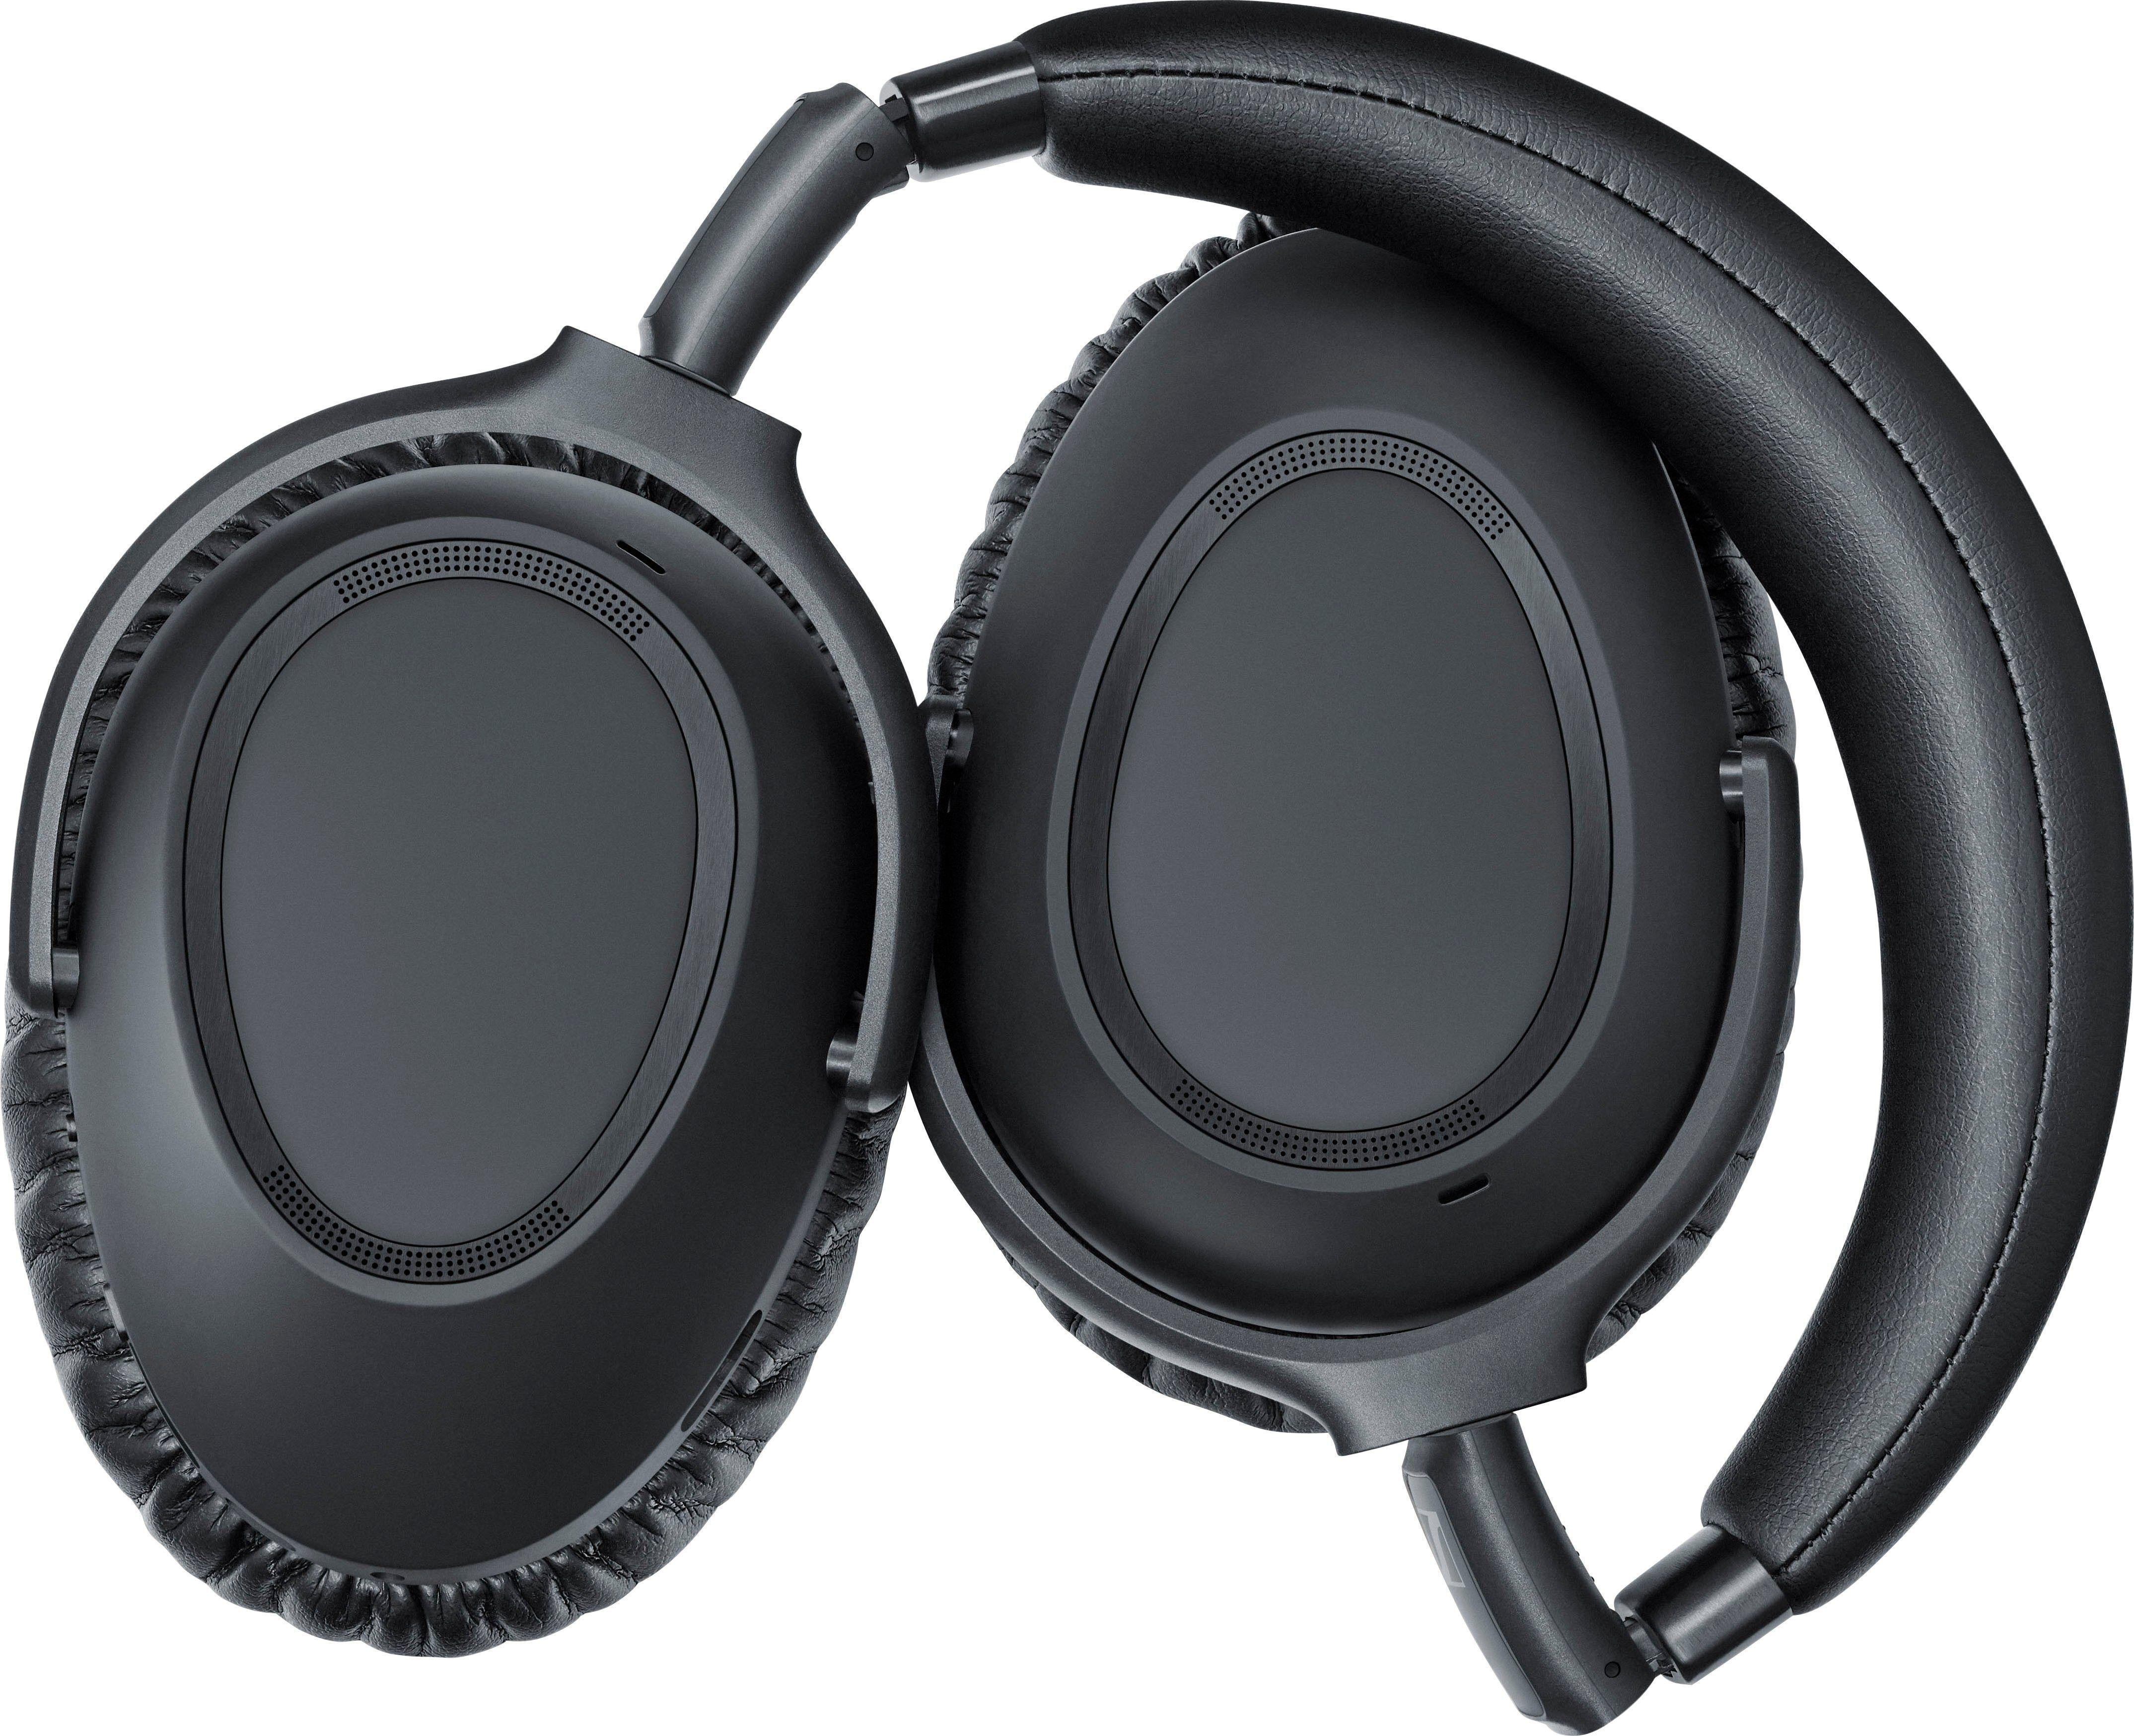 Sennheiser »PXC 550-II« Over-Ear-Kopfhörer (Alexa, Siri, Google Assistant, Bluetooth)